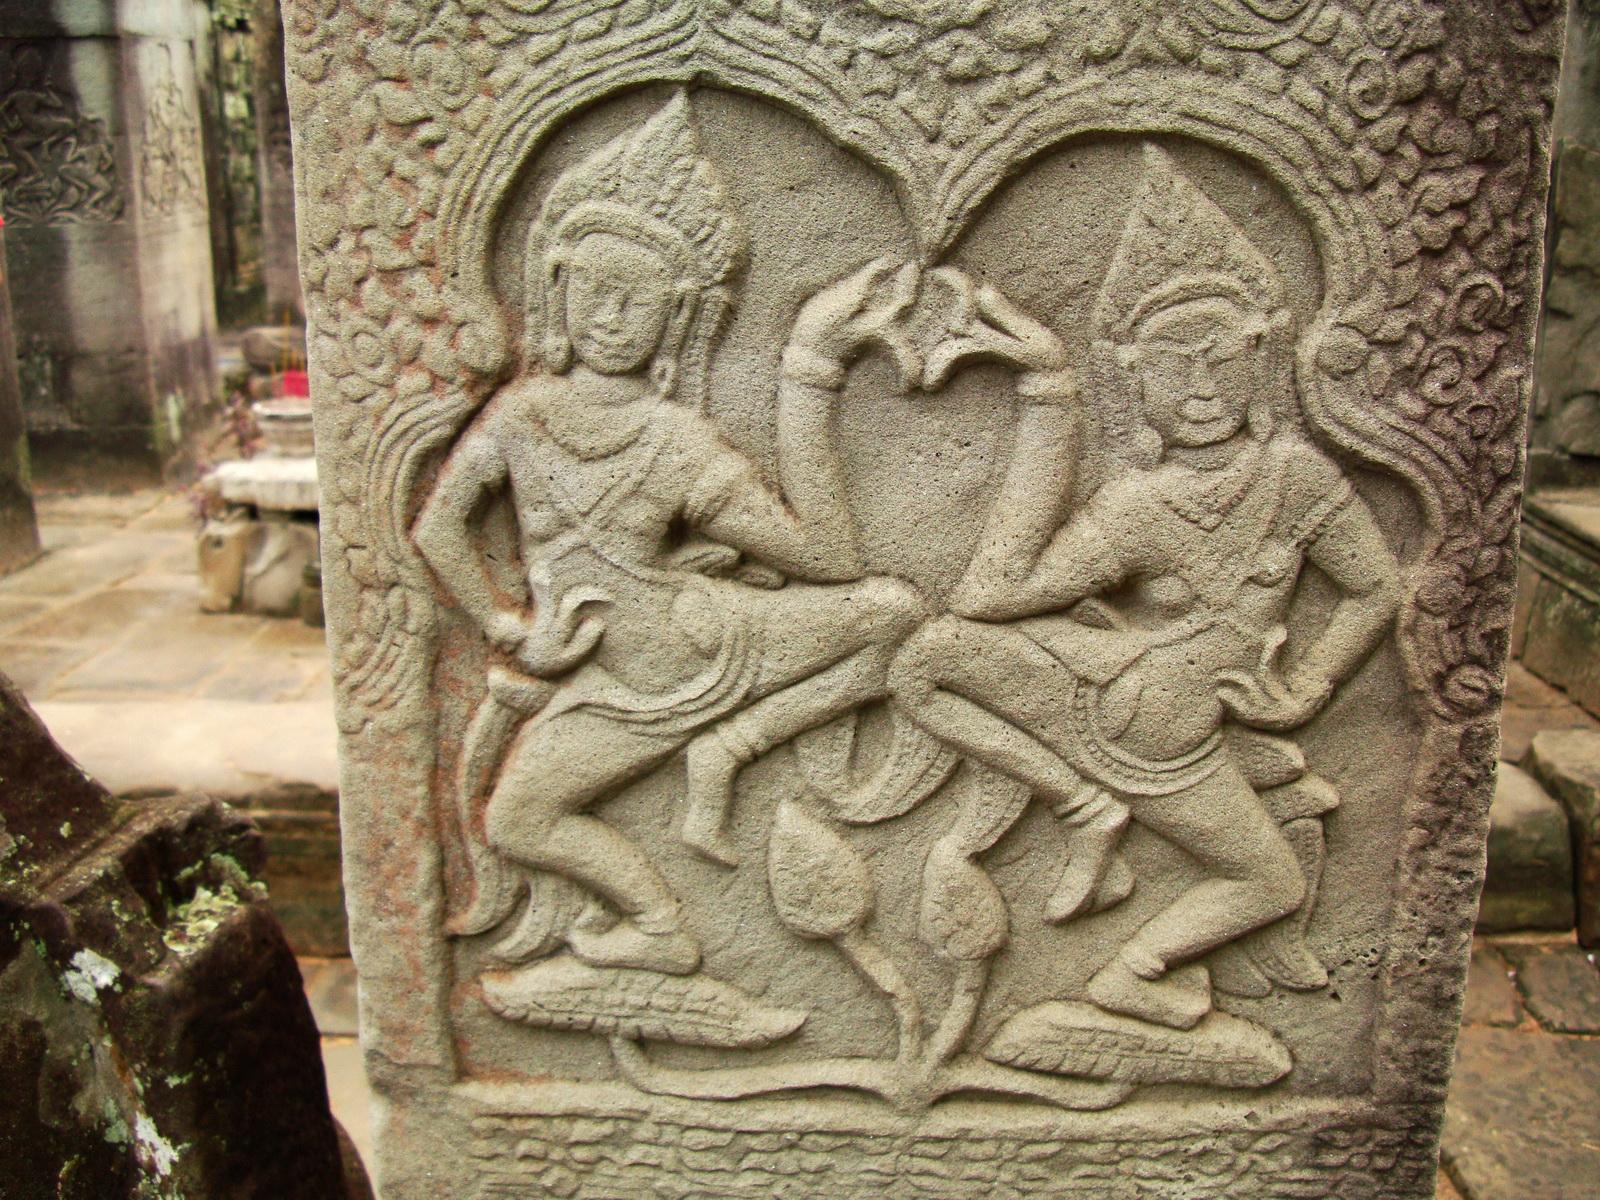 Bayon Temple Bas relief pillars two dancing apsaras Angkor 10